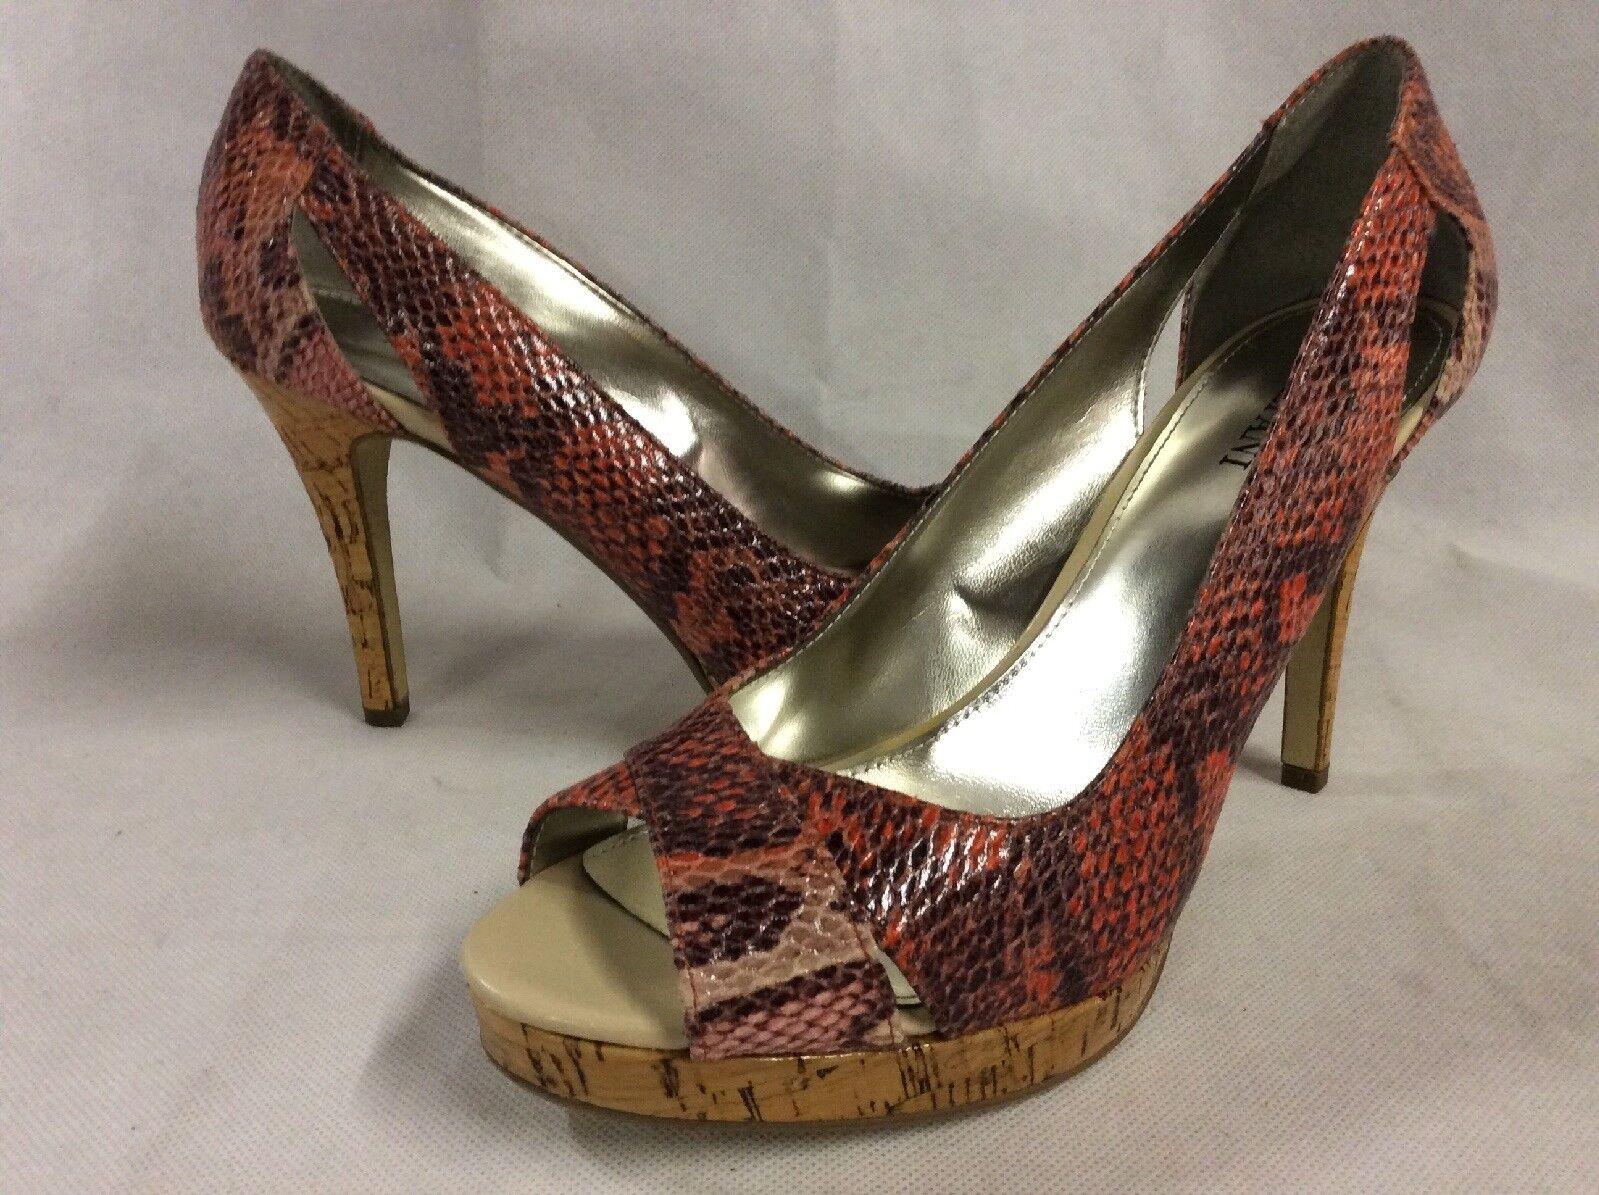 Alfani FAIRFAX Women's Heels Open Toe Shoes Multicolor Bridal Size 8 M...HIGHT 1